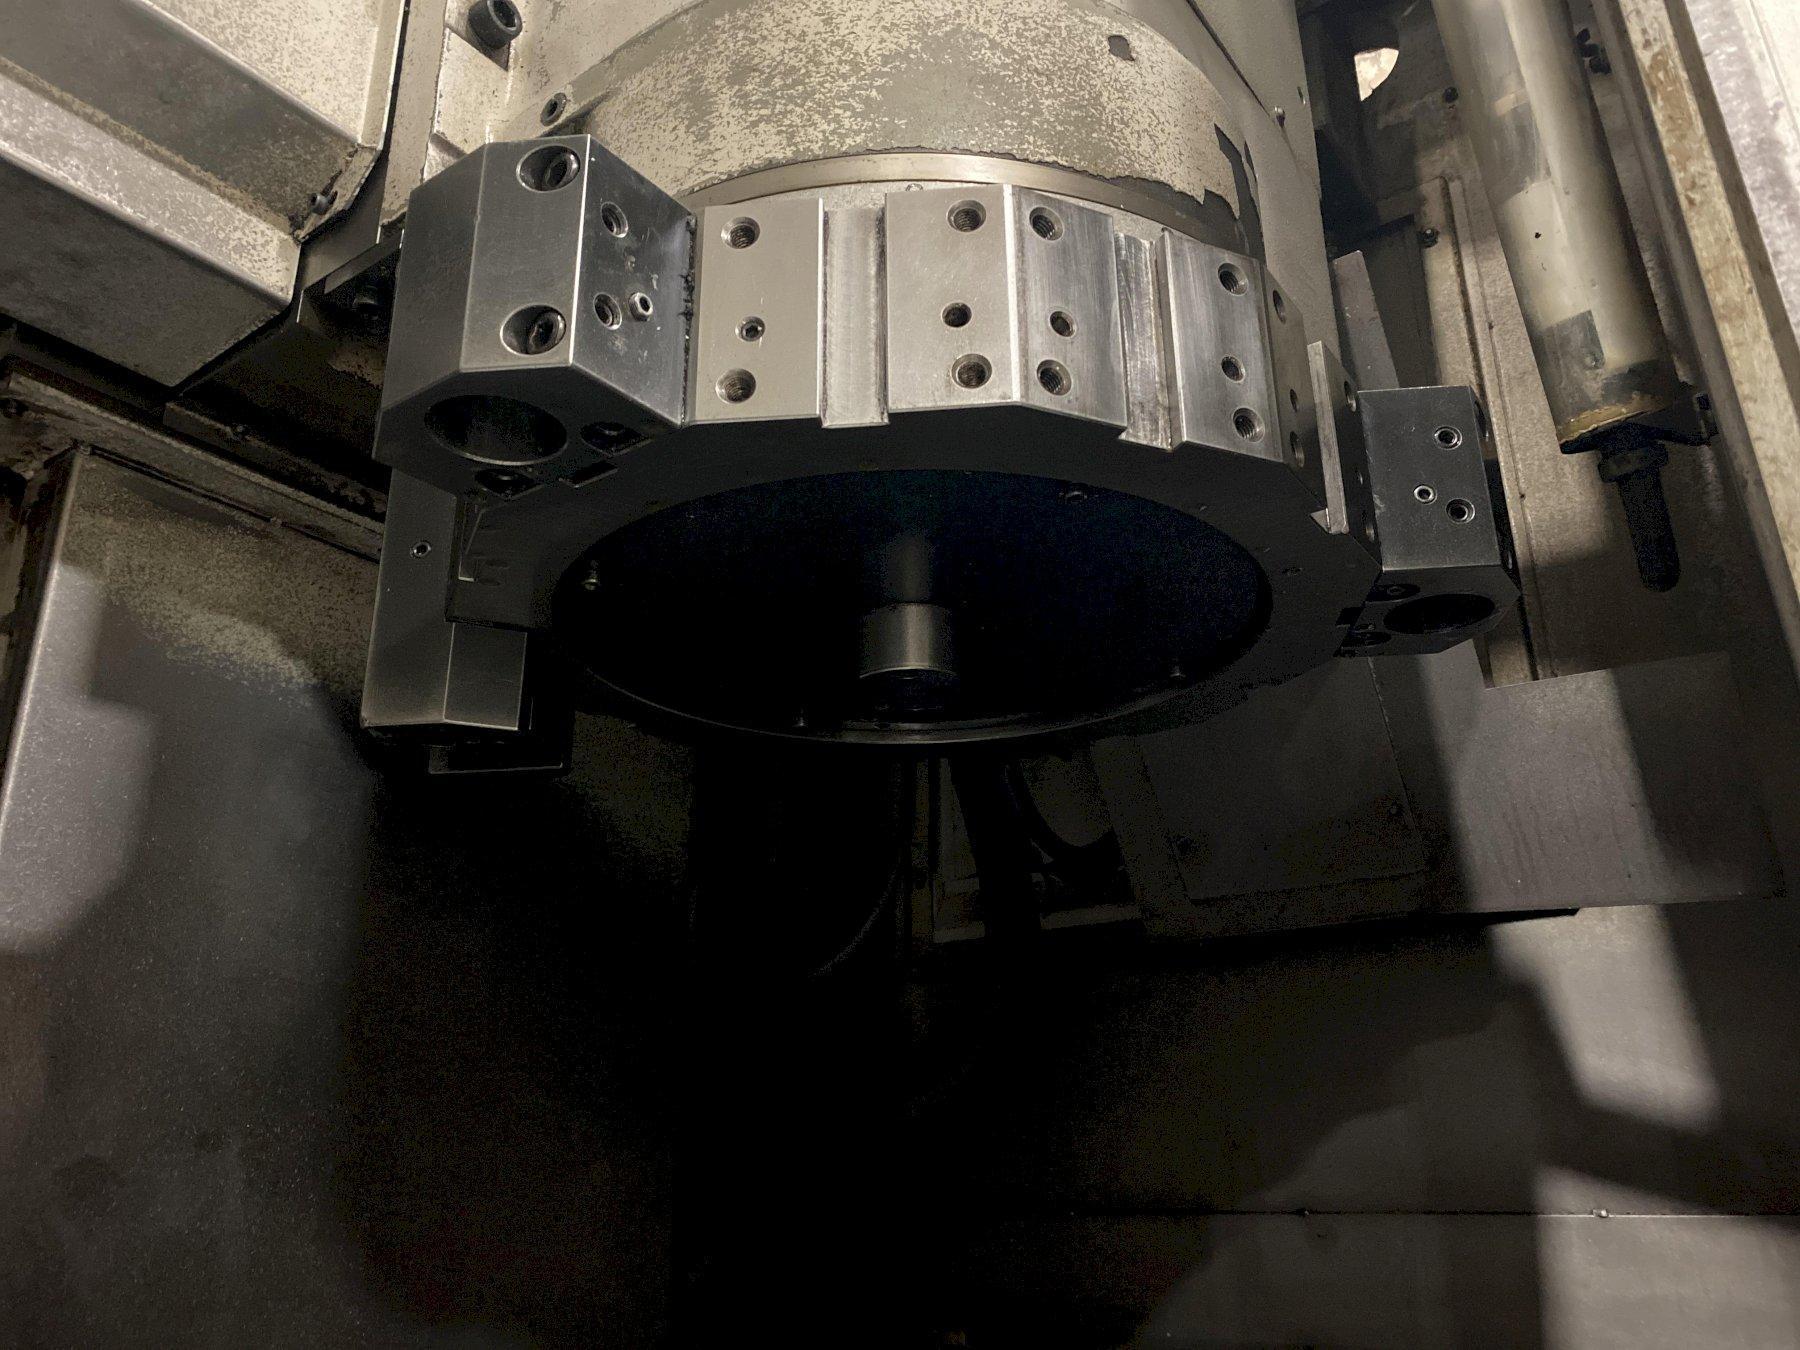 2011 Okuma 2SP-V40 - CNC Twin Spindle Vertical Turret Lathe